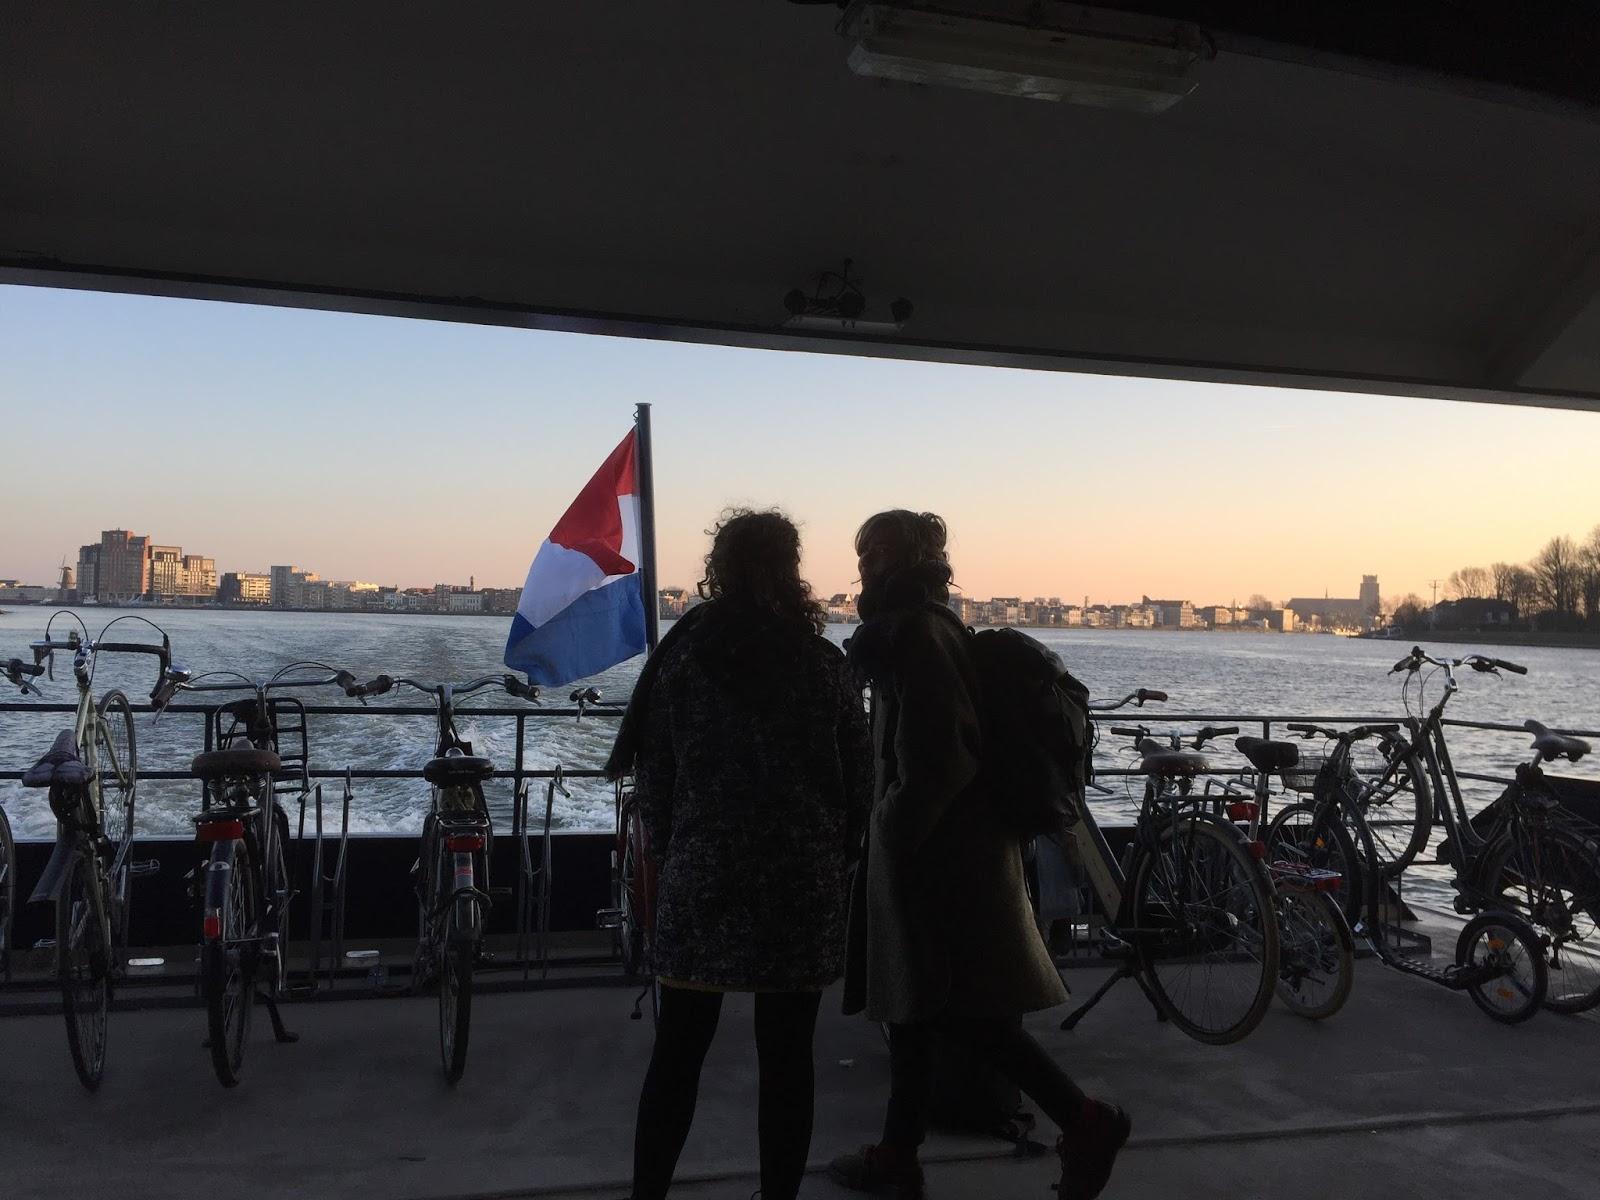 naj w Holandii